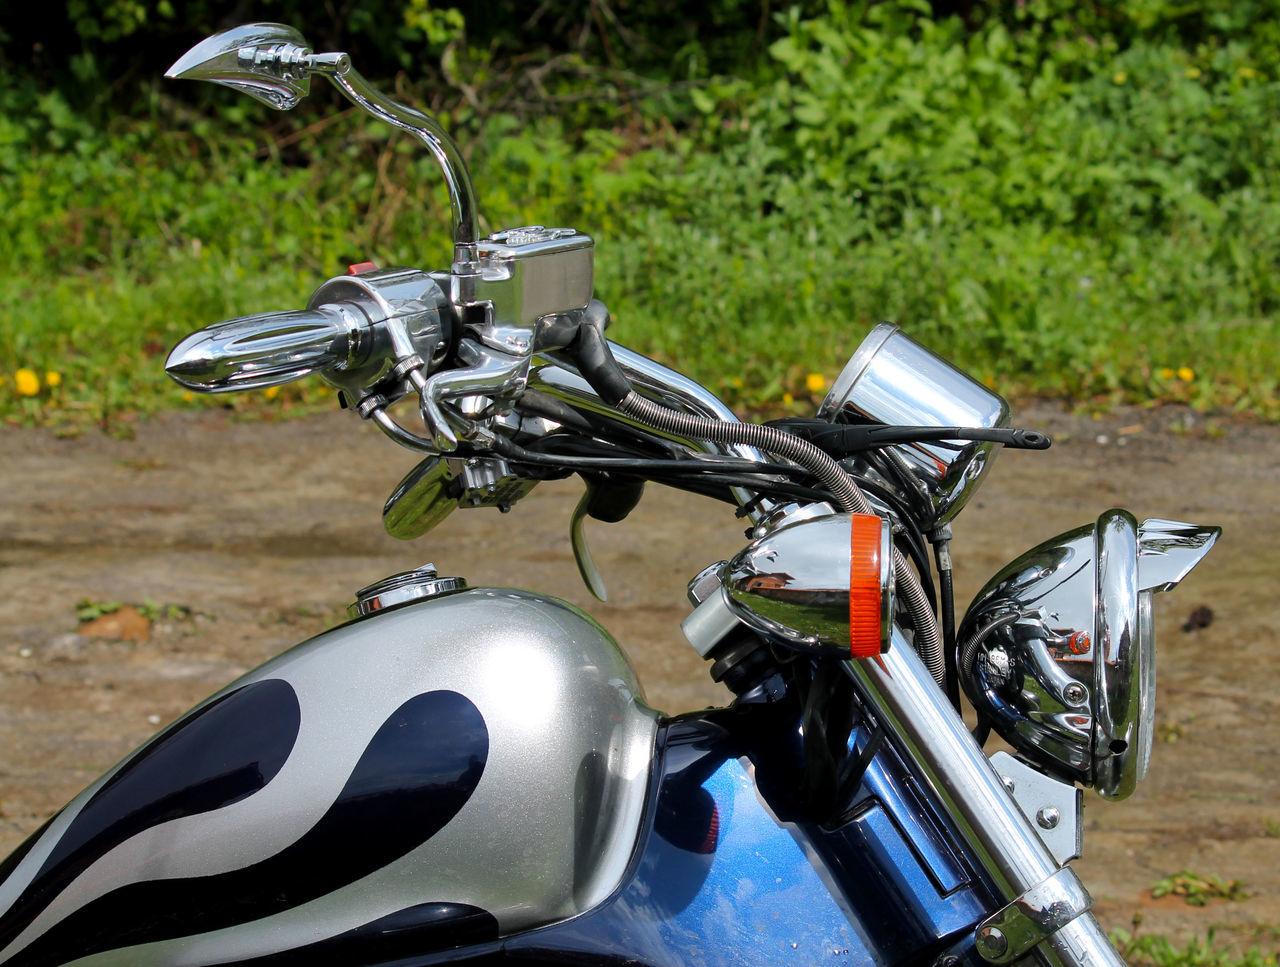 motorcykle,sport,bike,extreme,motorbike,people Motorcycle